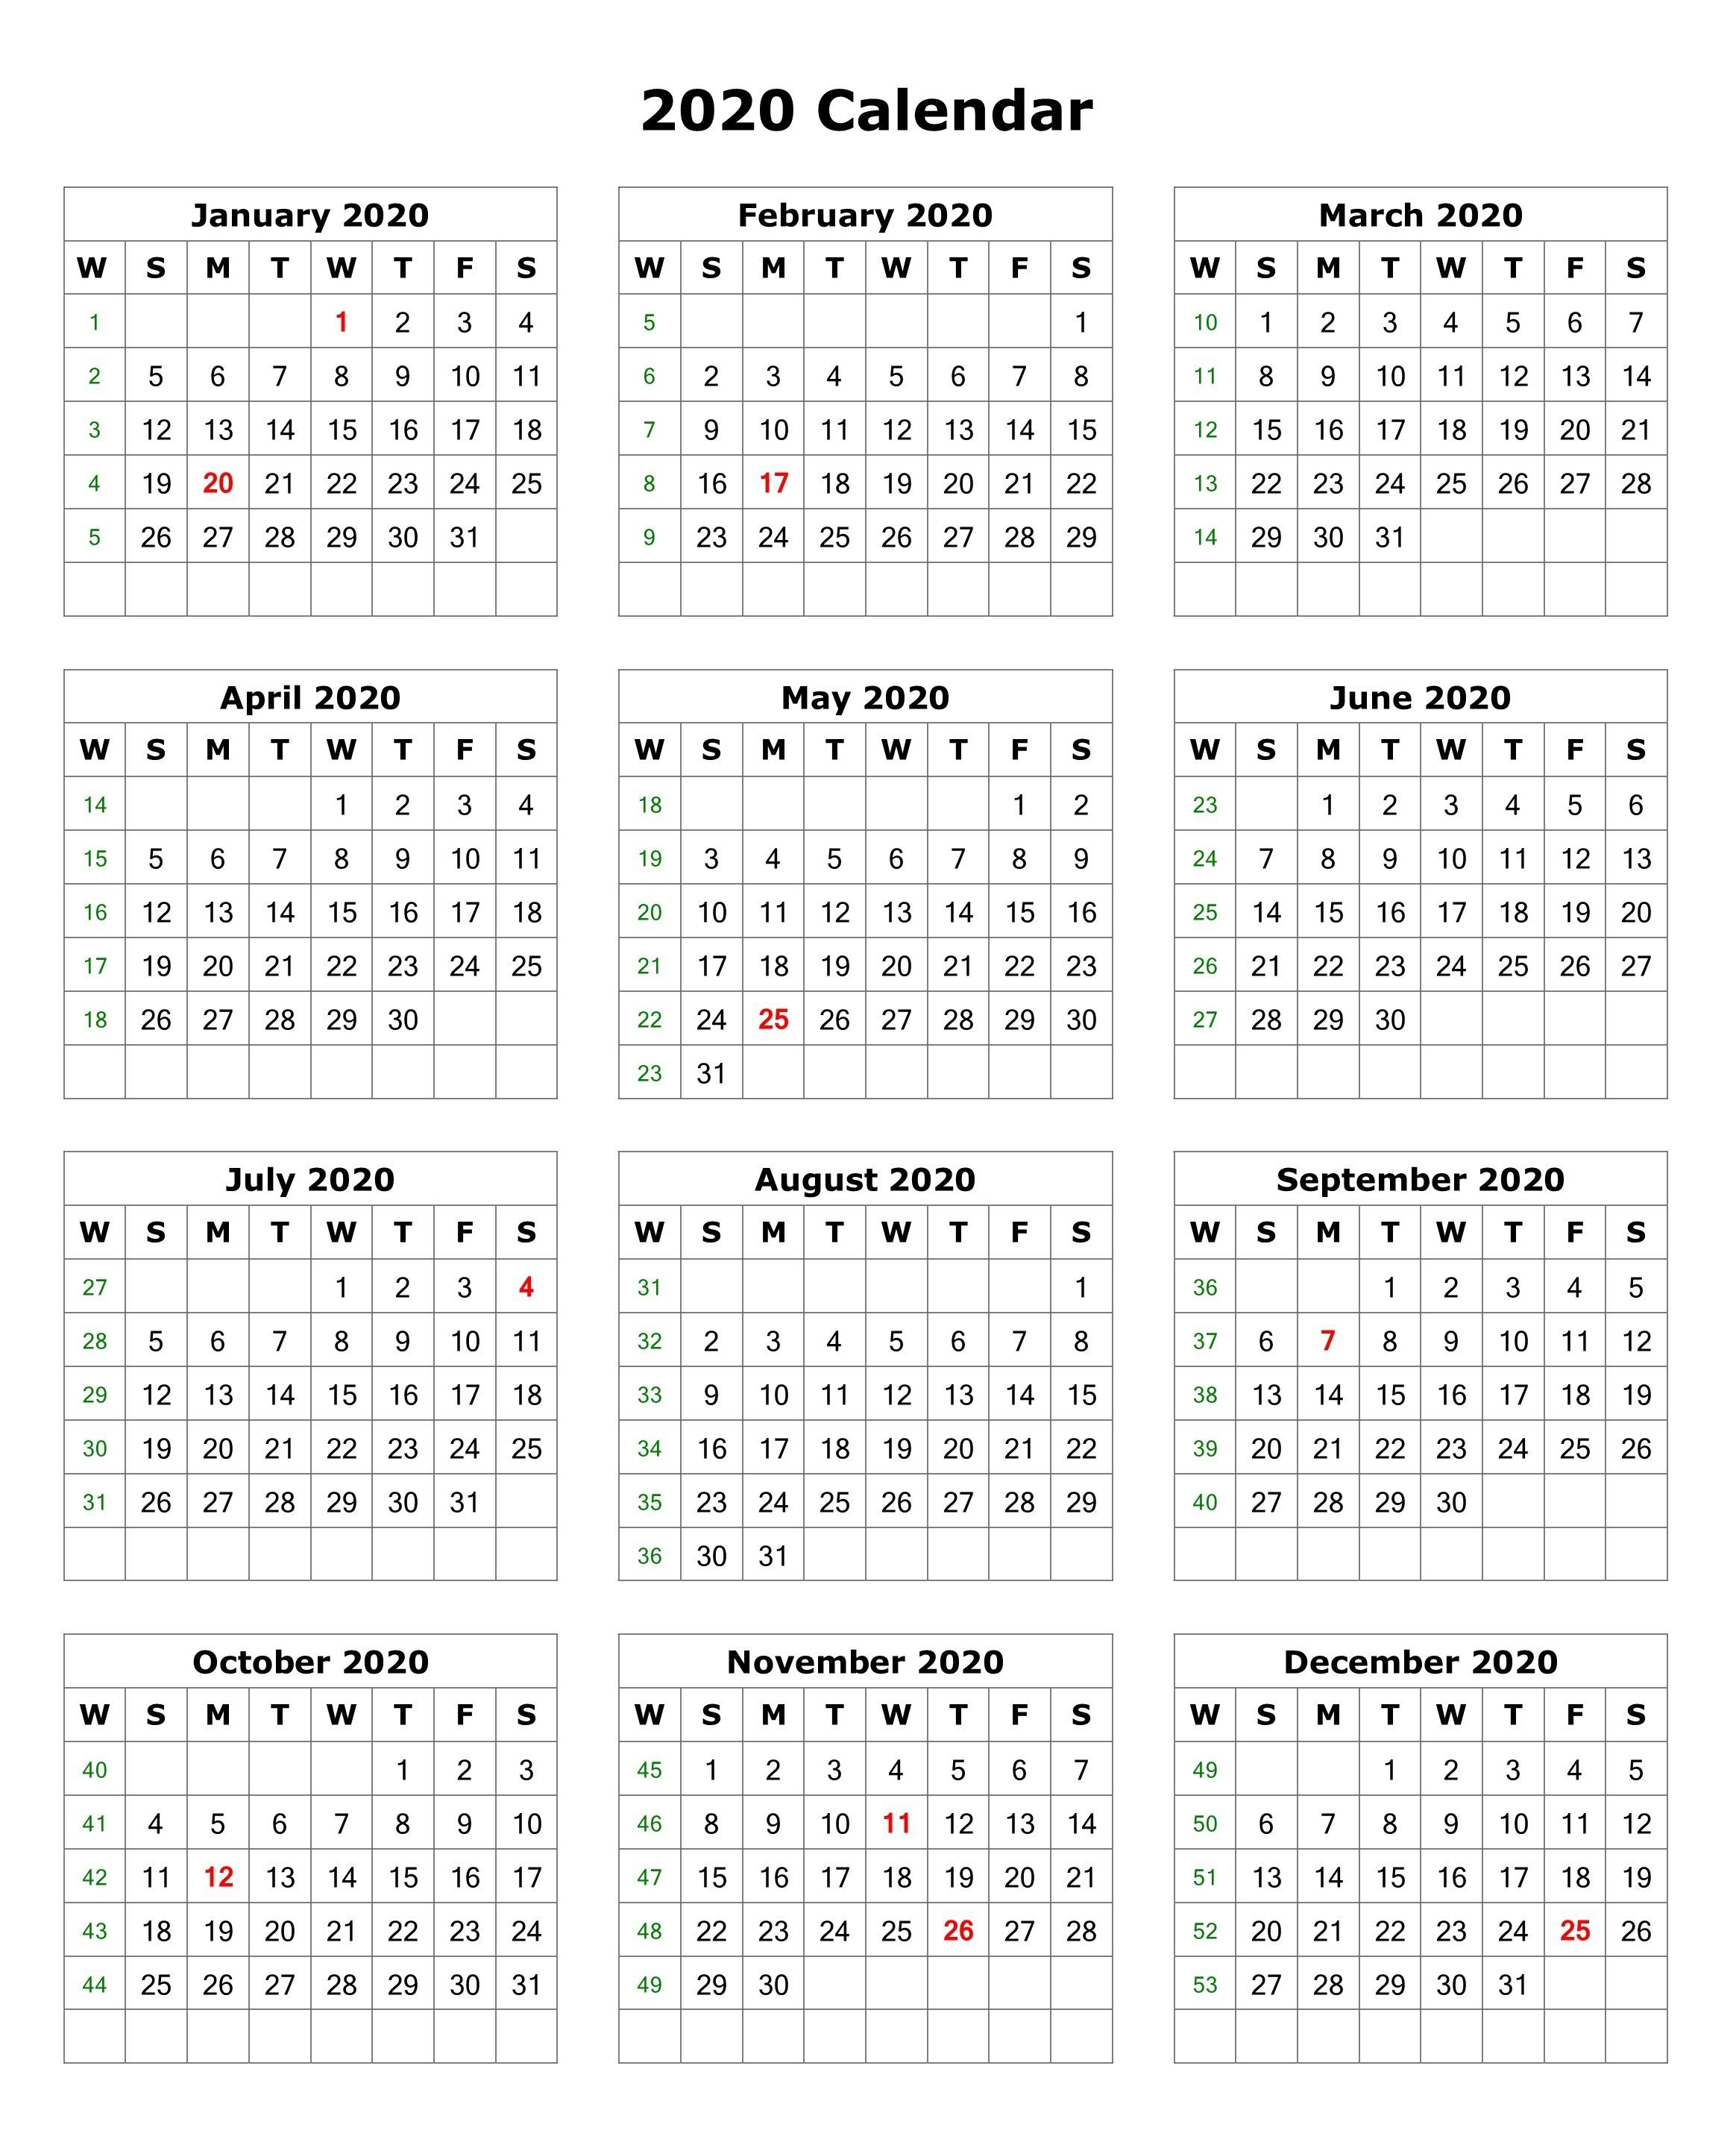 2020 One Page Portrait Calendar | 2020 Calendars | Calendar